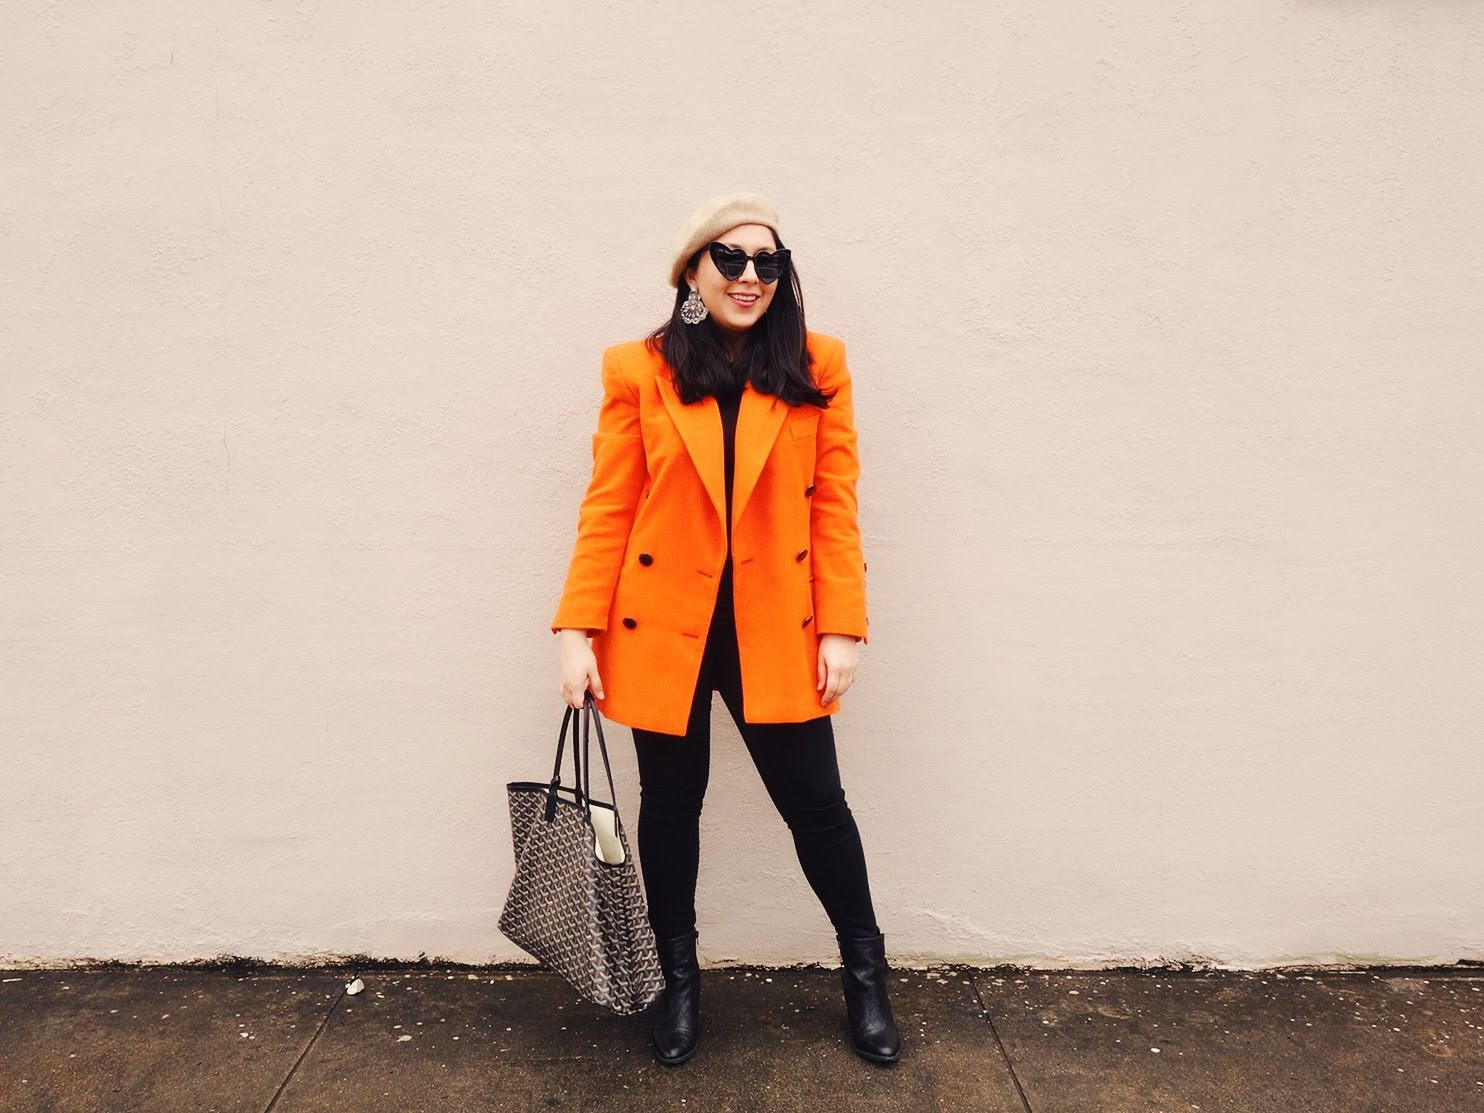 Orange Jacket, Orange Blazer Outfit, Orange and Black Outfit, Escada Blazer, Escada Vintage